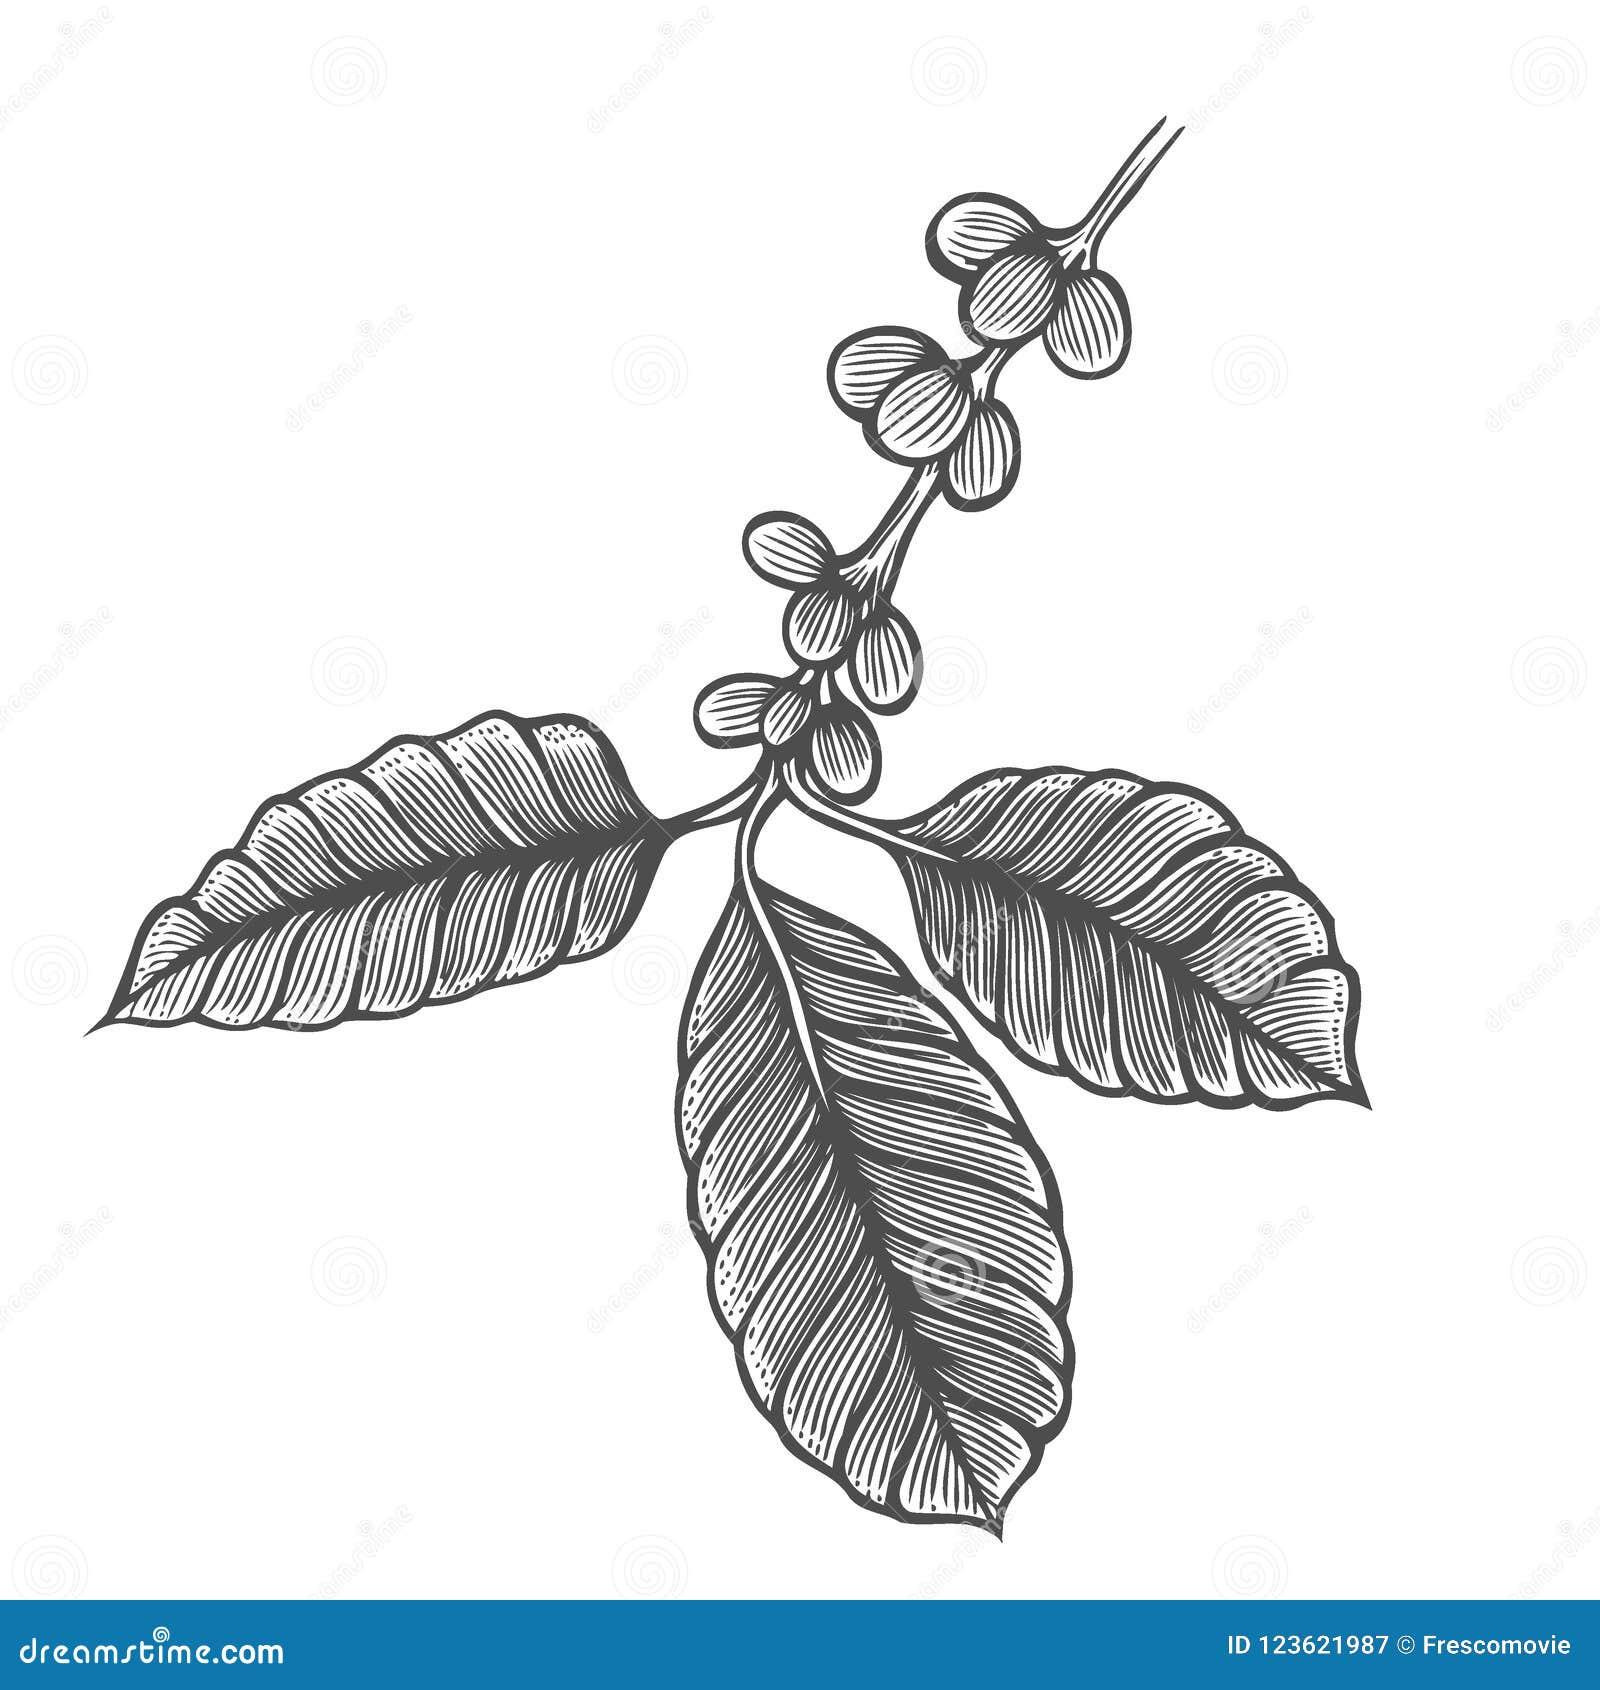 Coffee tree illustration stock vector illustration of design download coffee tree illustration stock vector illustration of design 123621987 thecheapjerseys Gallery